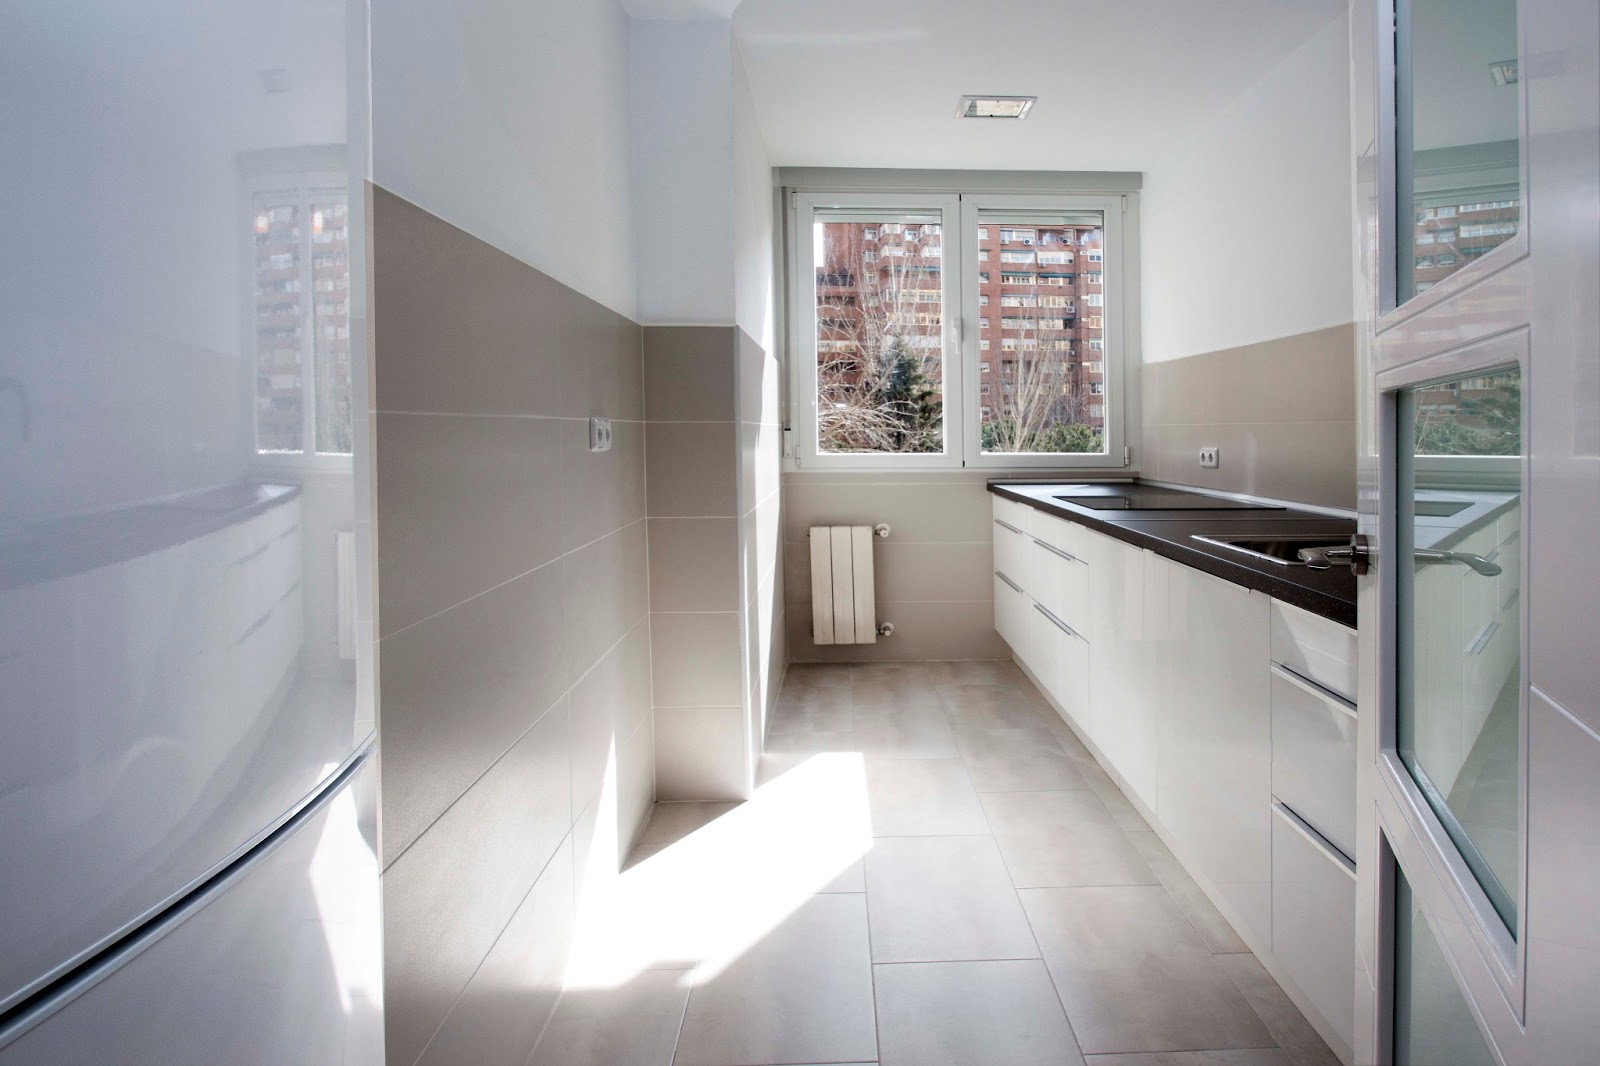 Fotos de azulejos de cocina - Azulejos de cocina fotos ...